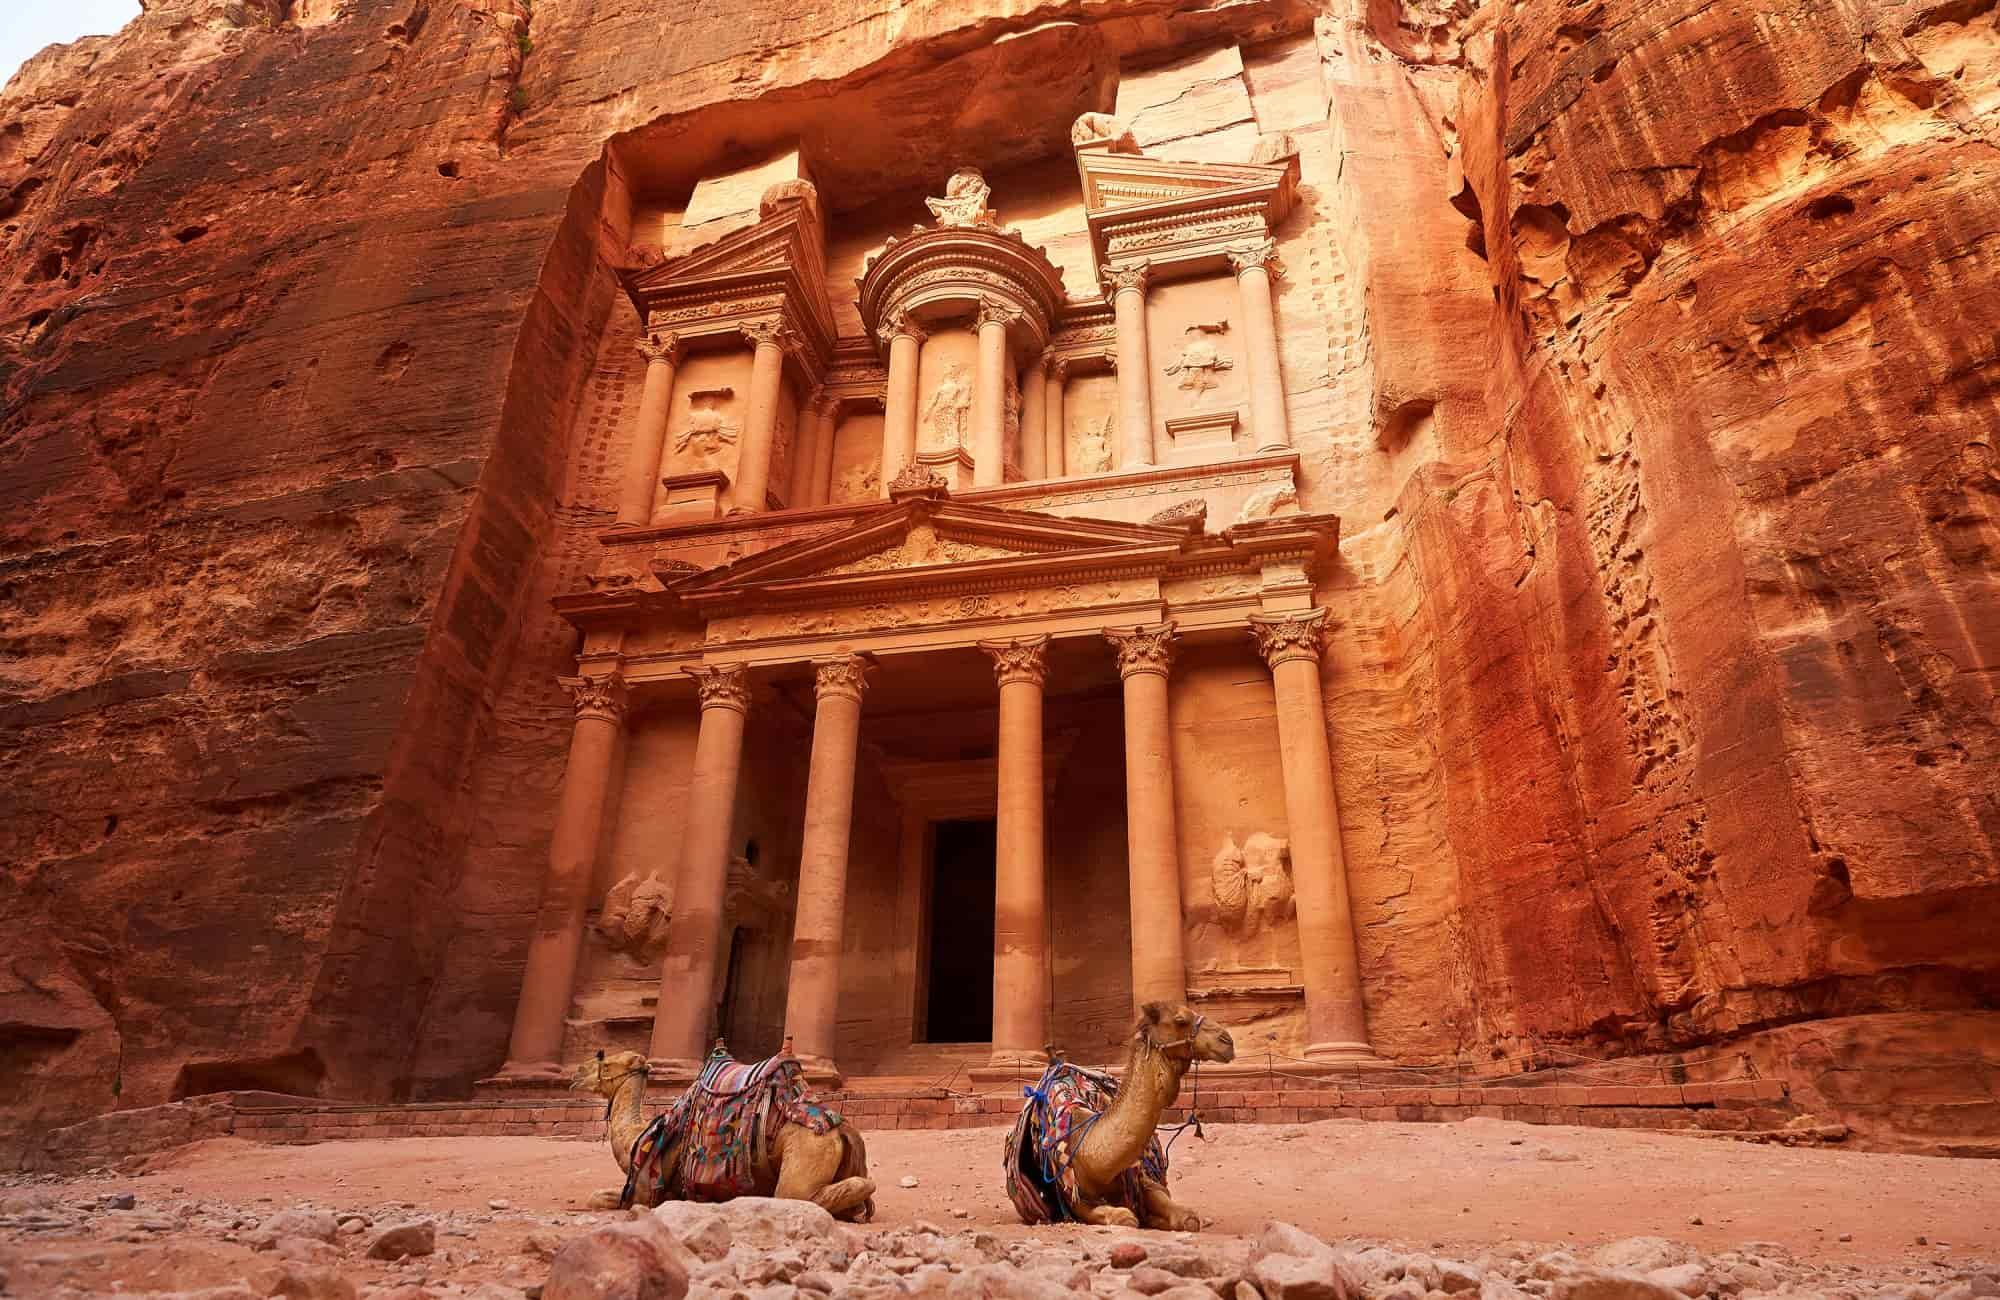 Voyage Jordanie - Petra Khazneh - Amplitudes